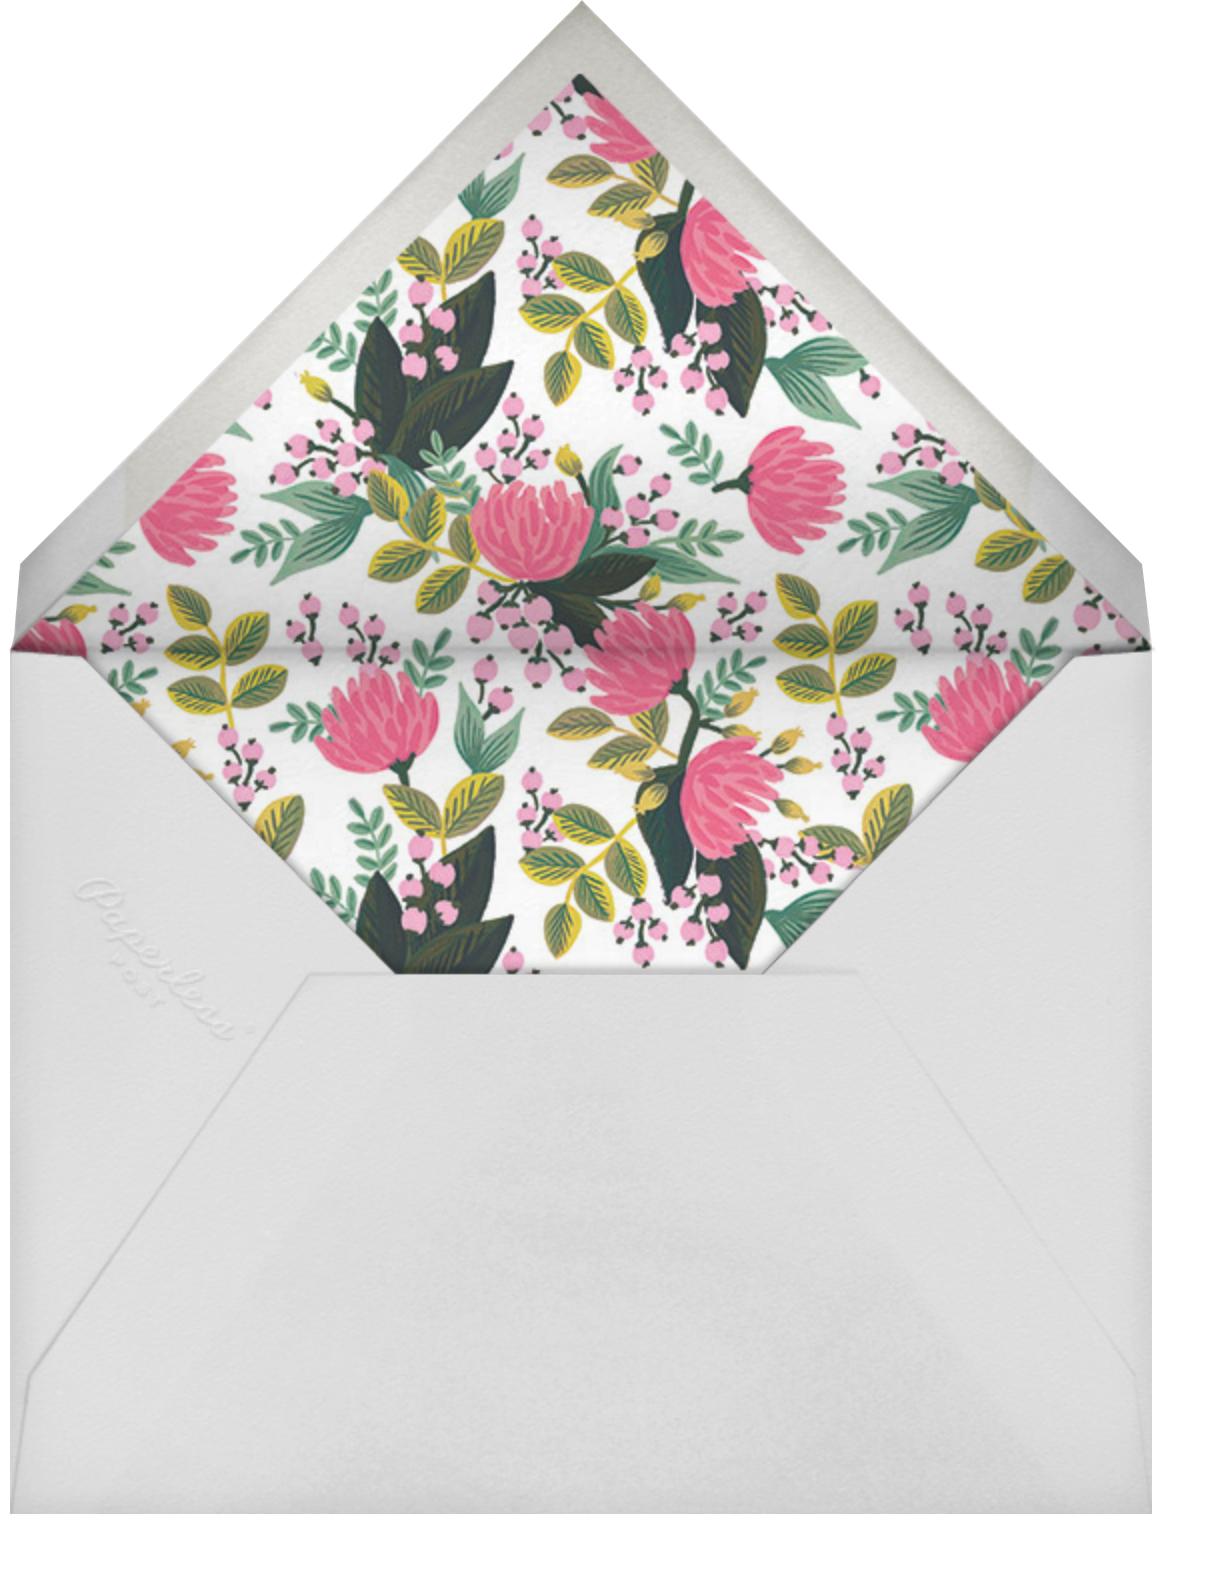 Saigon Blooms (Photo) - Meringue - Rifle Paper Co. - Baptism  - envelope back